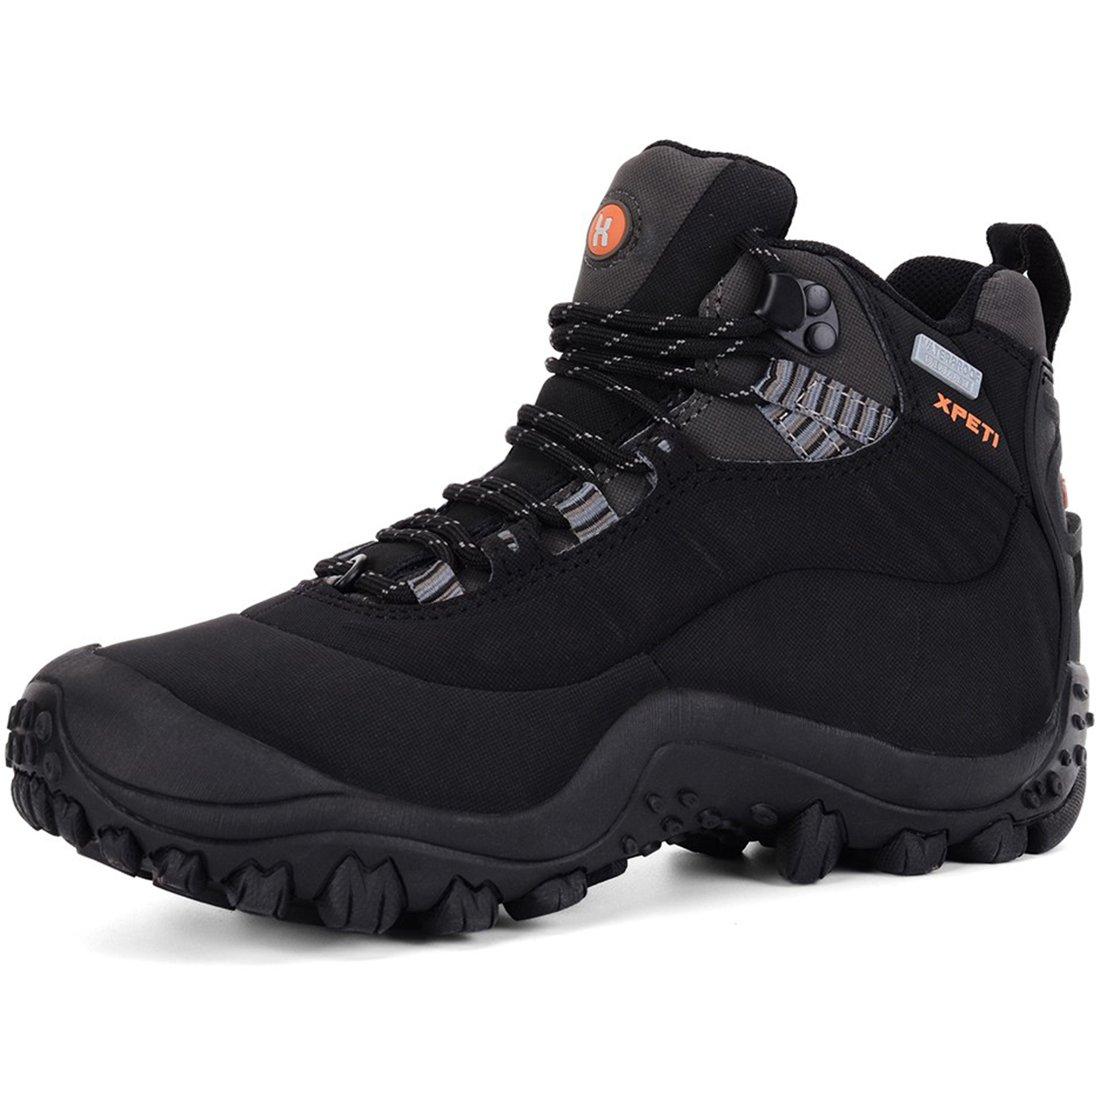 XPETI Women's Waterproof Hiking Outdoor Boot Black 9 B(M) US B079DL8Y44 Parent